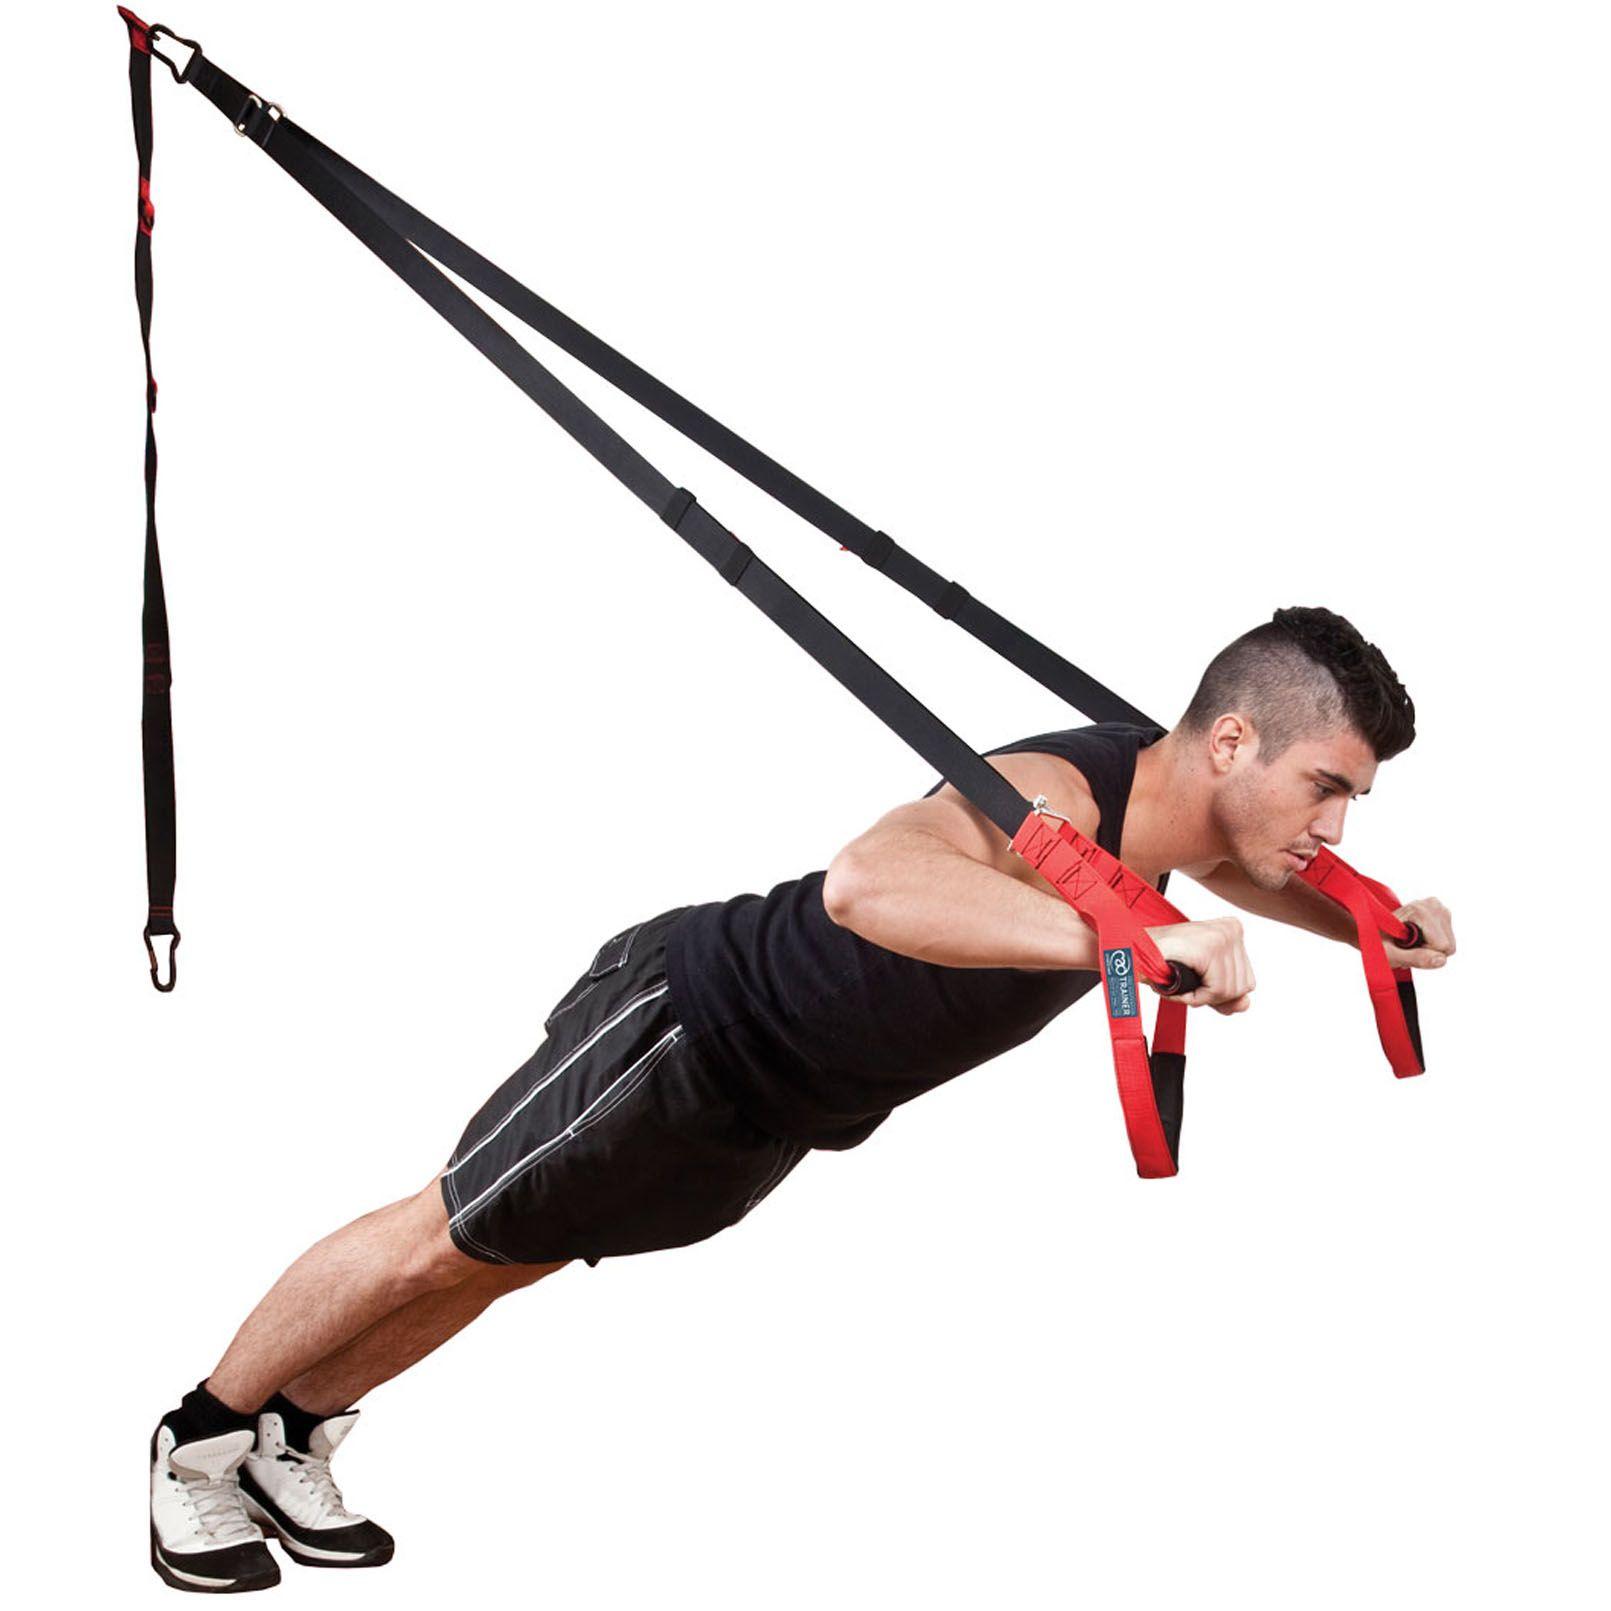 Fitness Mad Pro Suspension Trainer - Sweatband.com